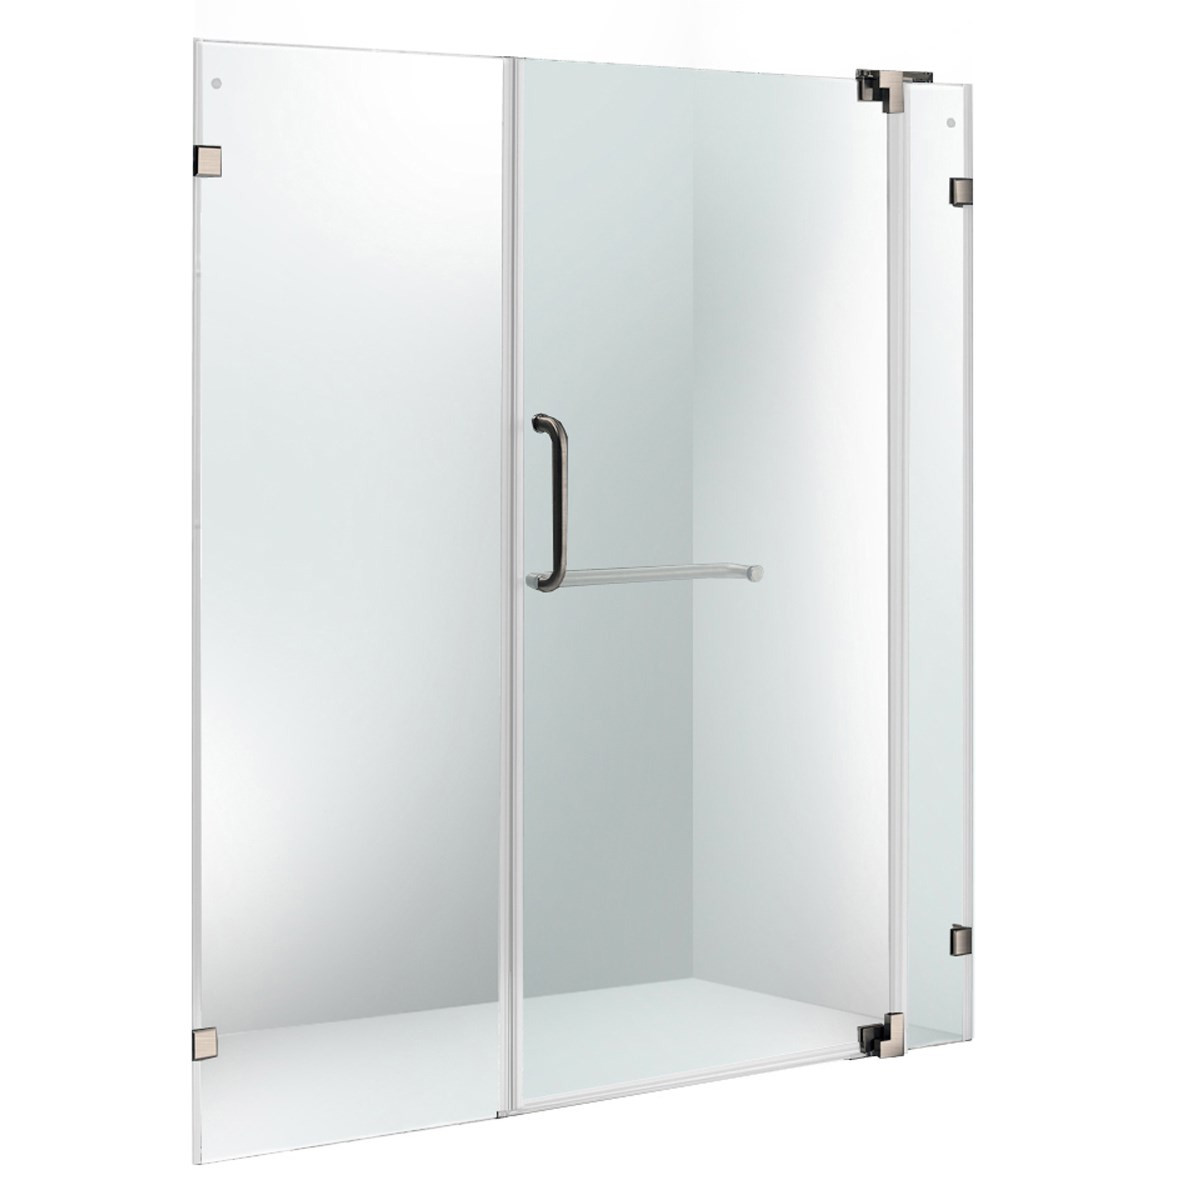 VIGO VG6042BNCL66 Pirouette Clear Glass Frameless Shower Door With Brushed Nickel Hardware